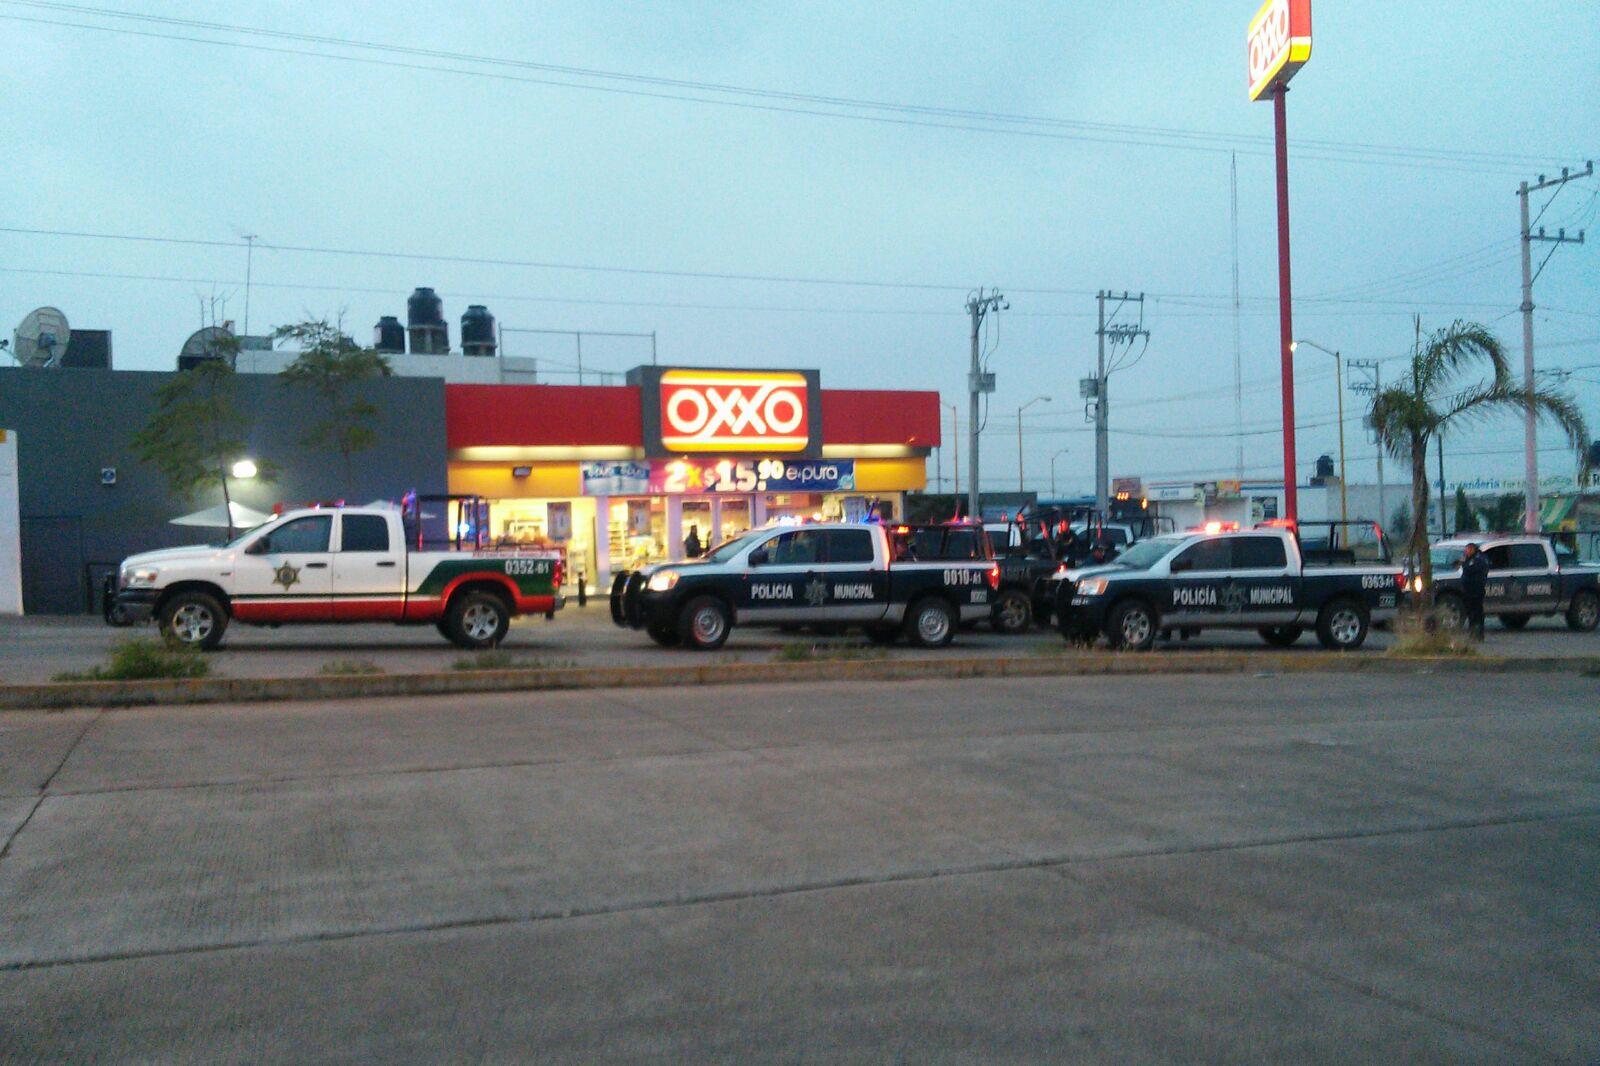 ¡Asaltó un OXXO con una nota de amenaza, pero terminó detenido en Aguascalientes!